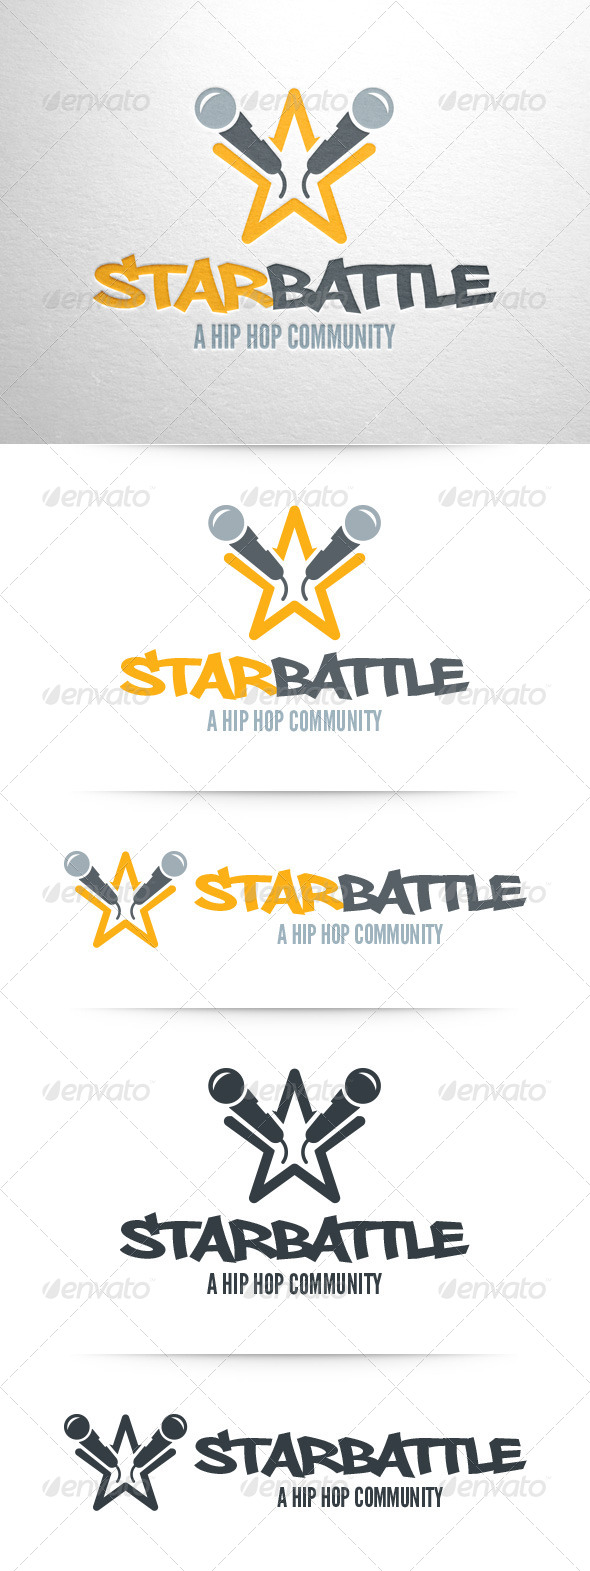 GraphicRiver Star Battle Logo Template 7955429